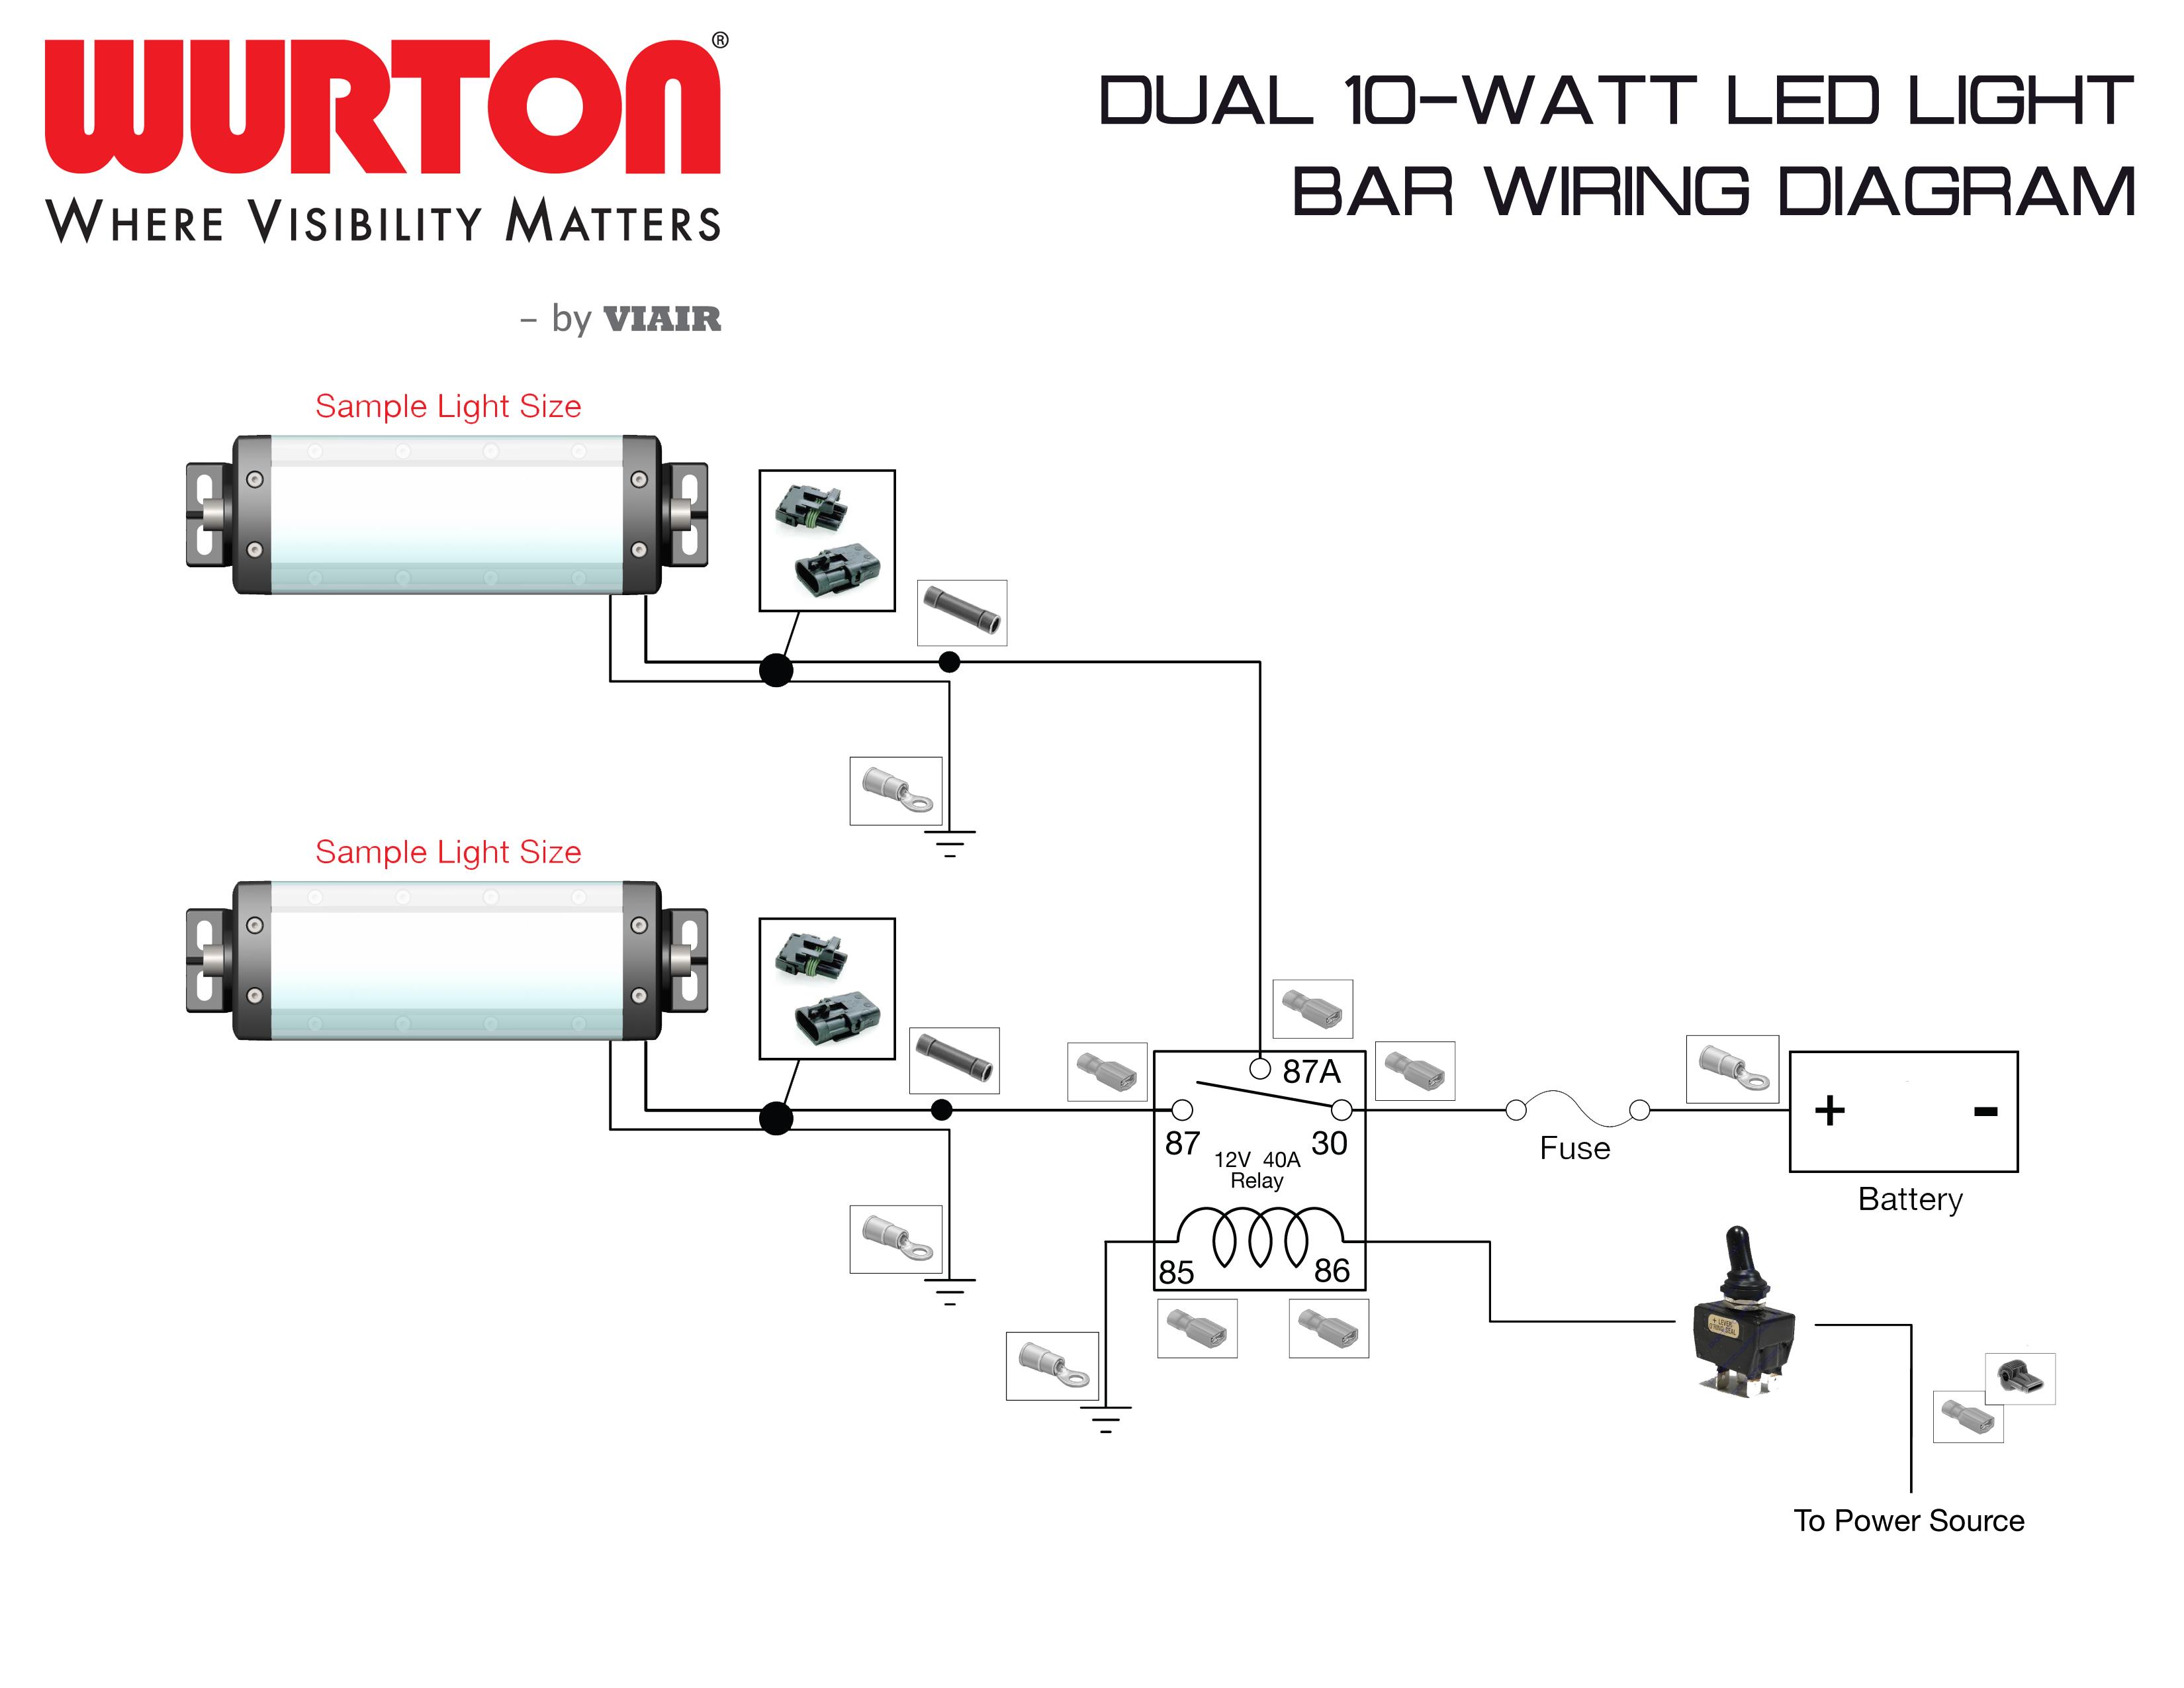 Light Bar Wire Diagram | Manual E-Books - Led Light Bar Wiring Harness Diagram